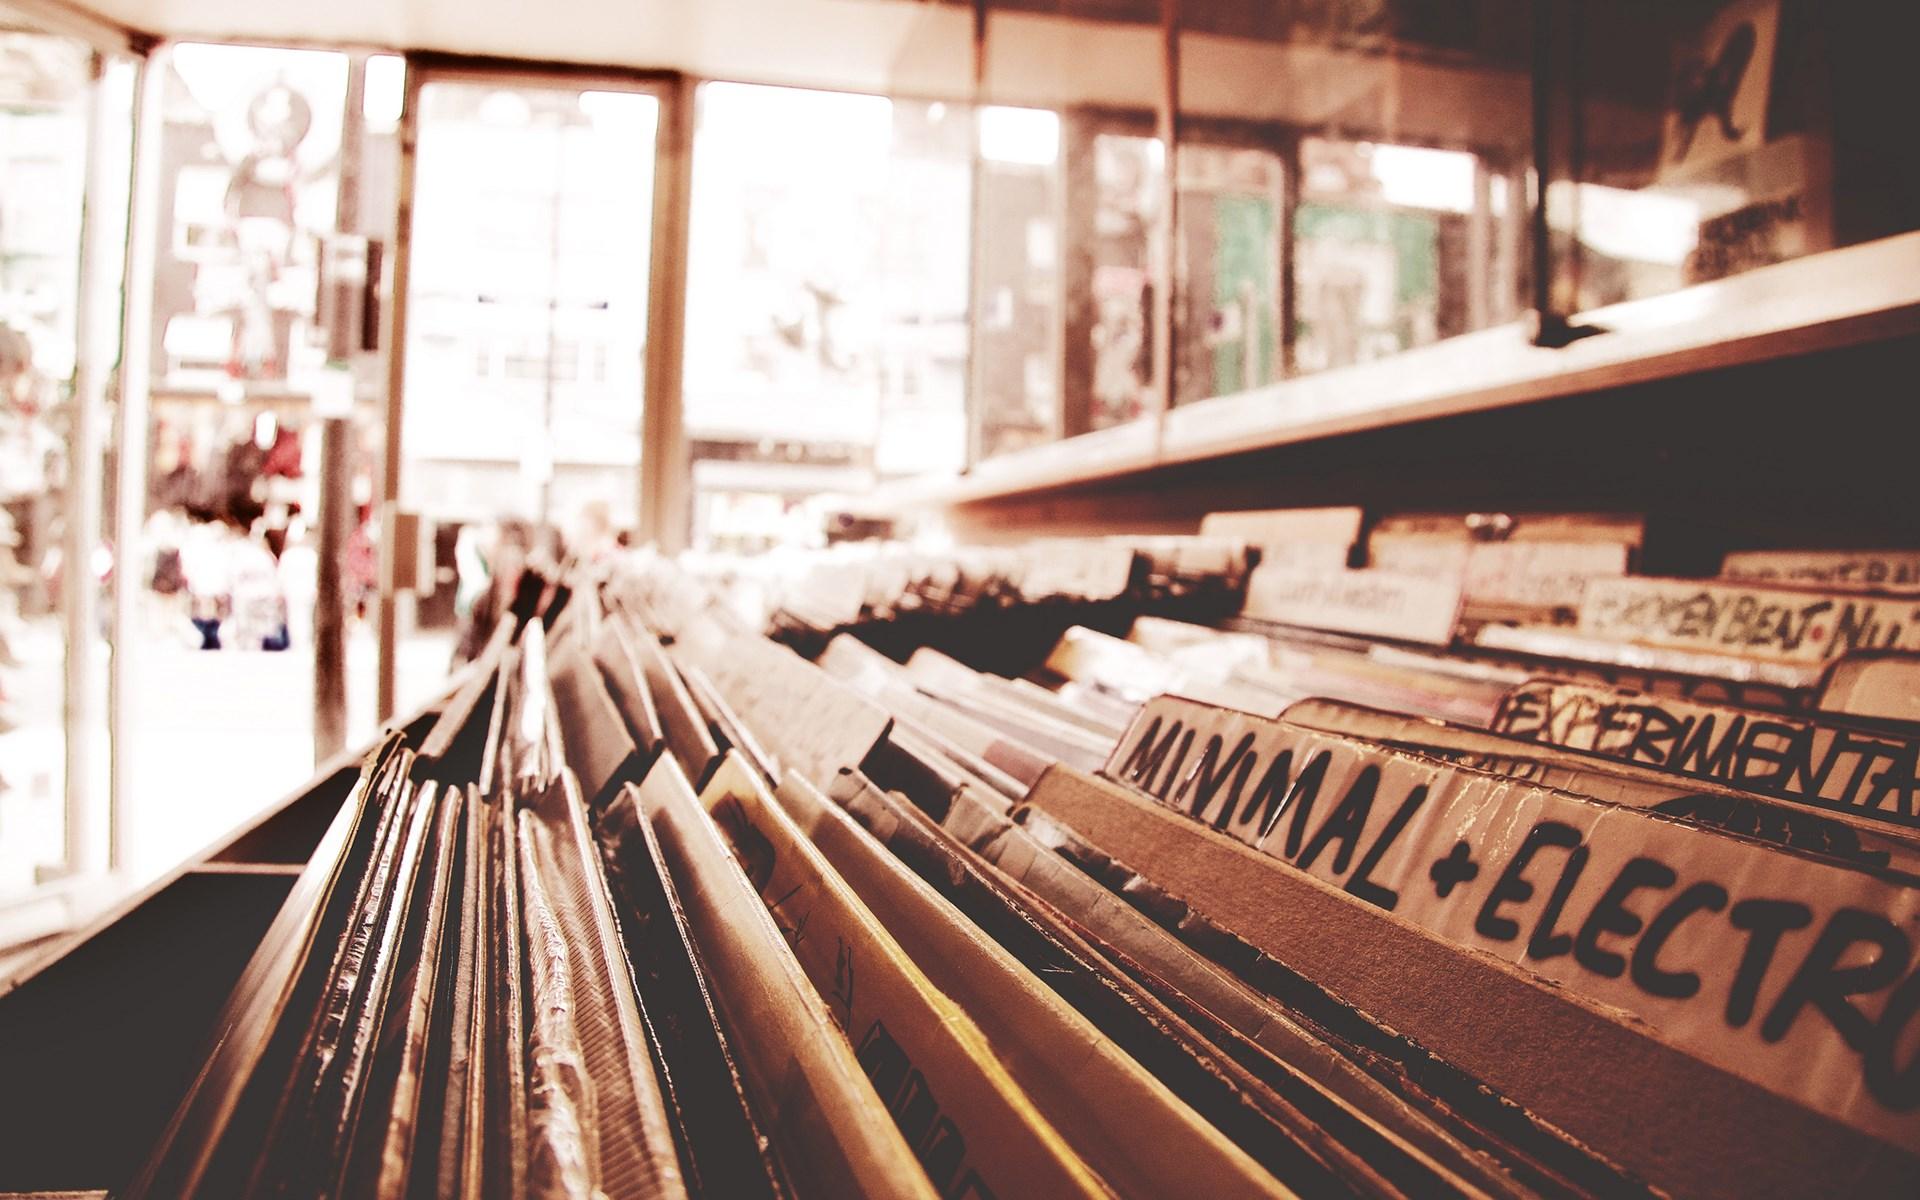 6959225-record-store-photo